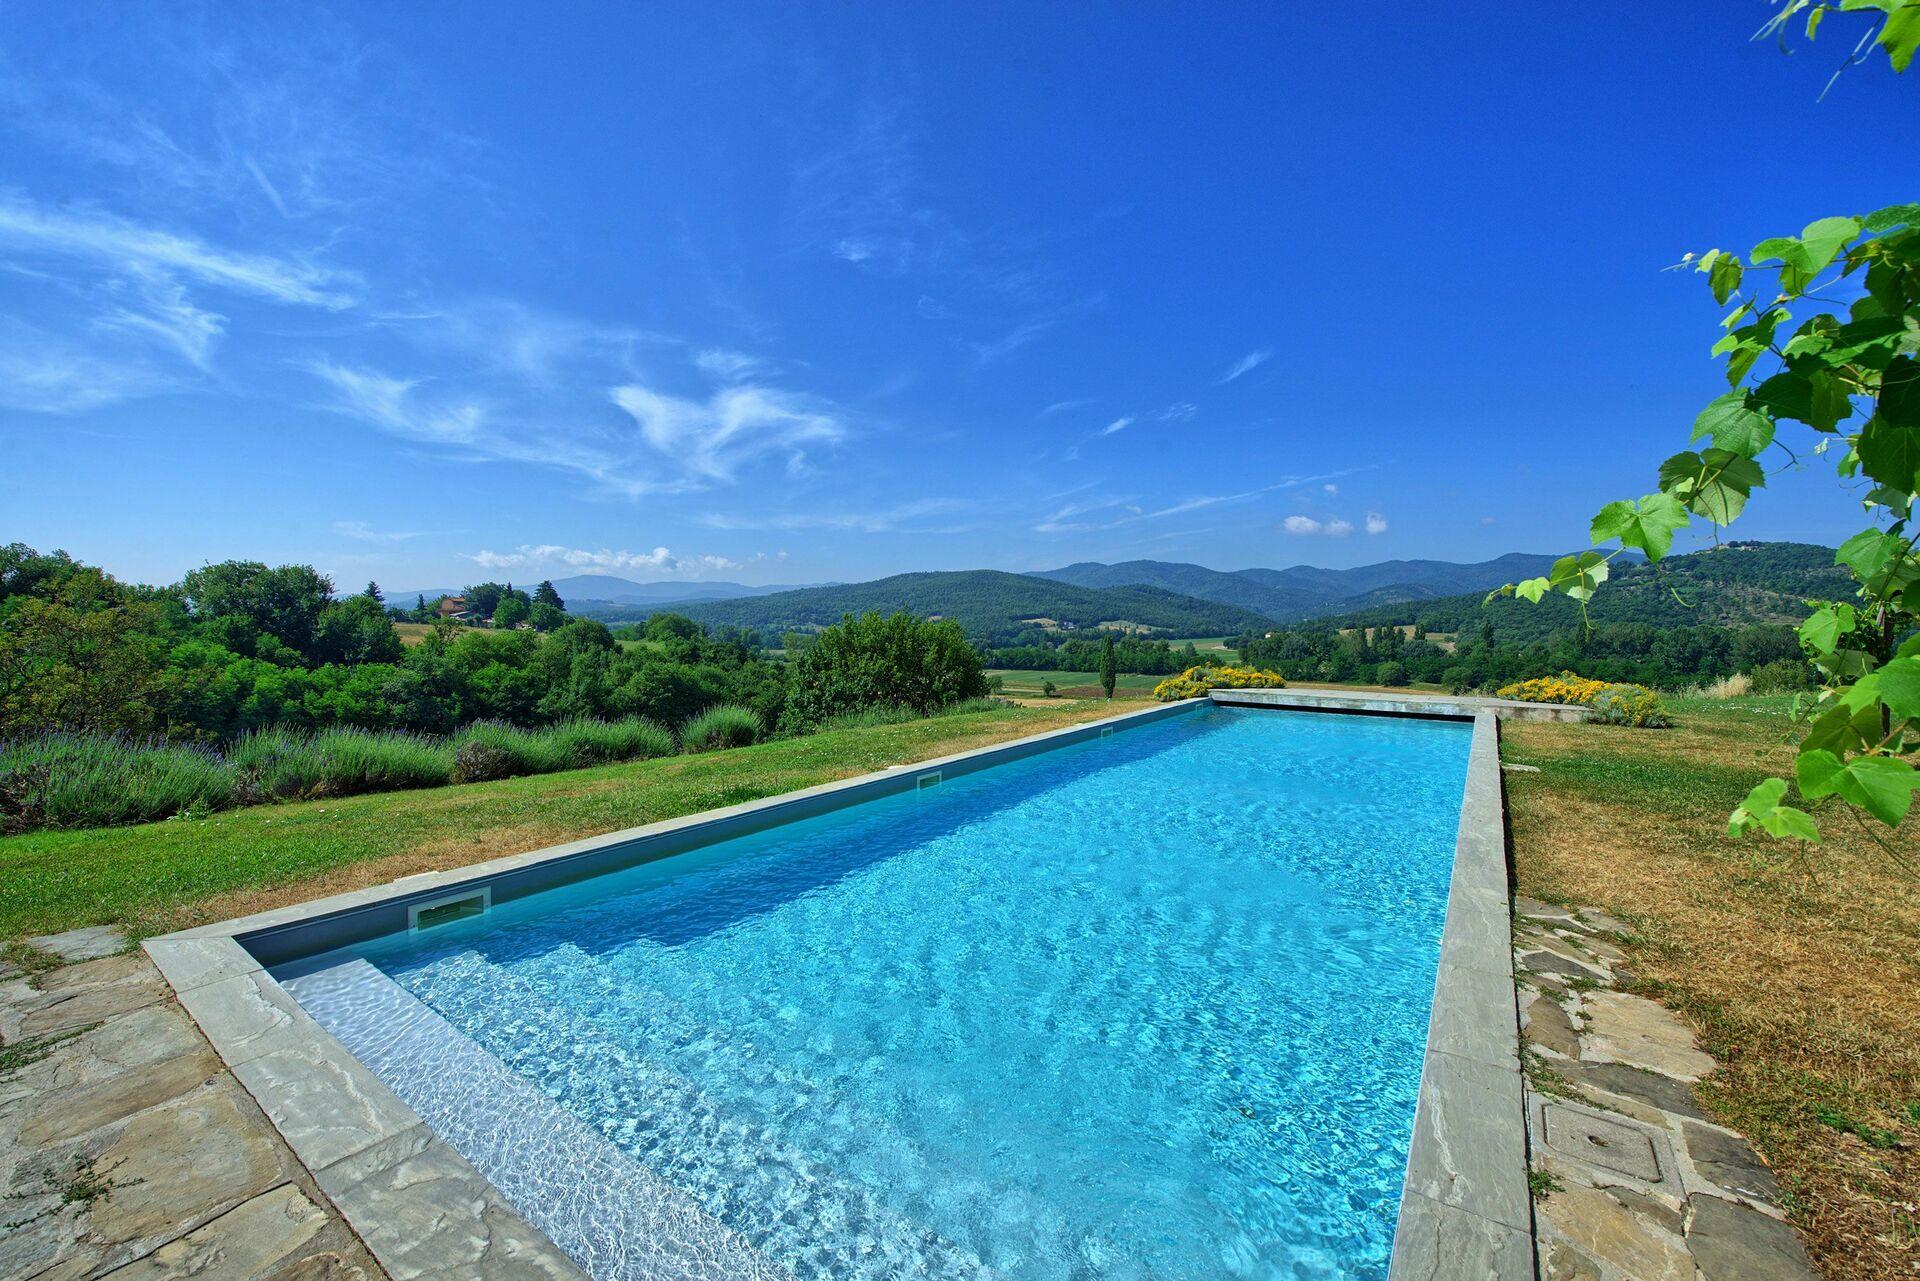 Anghiari Italy Map.Dolce Vita Holiday Apartment Rental In Hamlet In Anghiari Tuscany